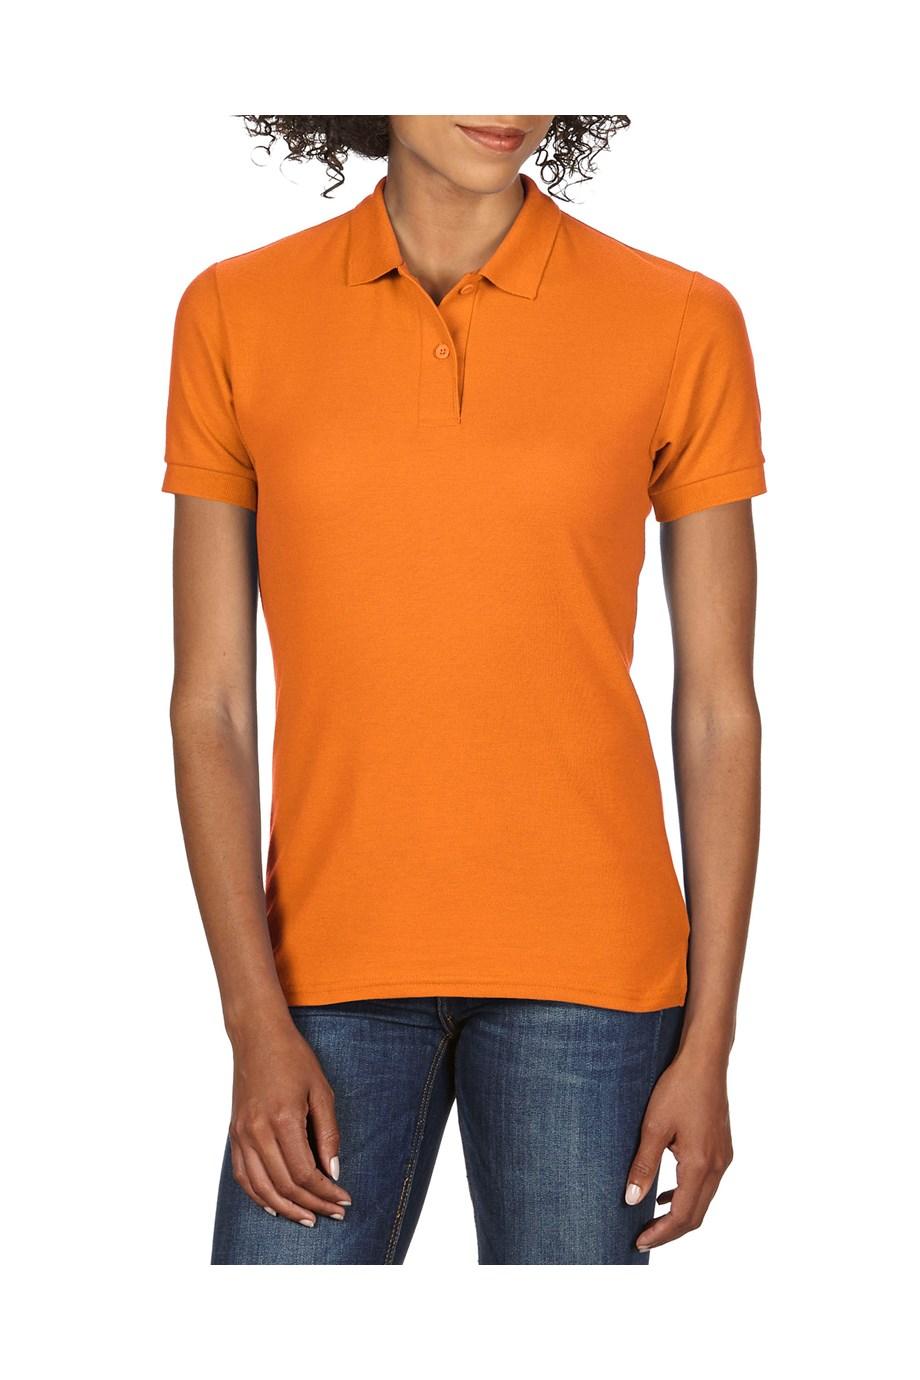 fluor orange